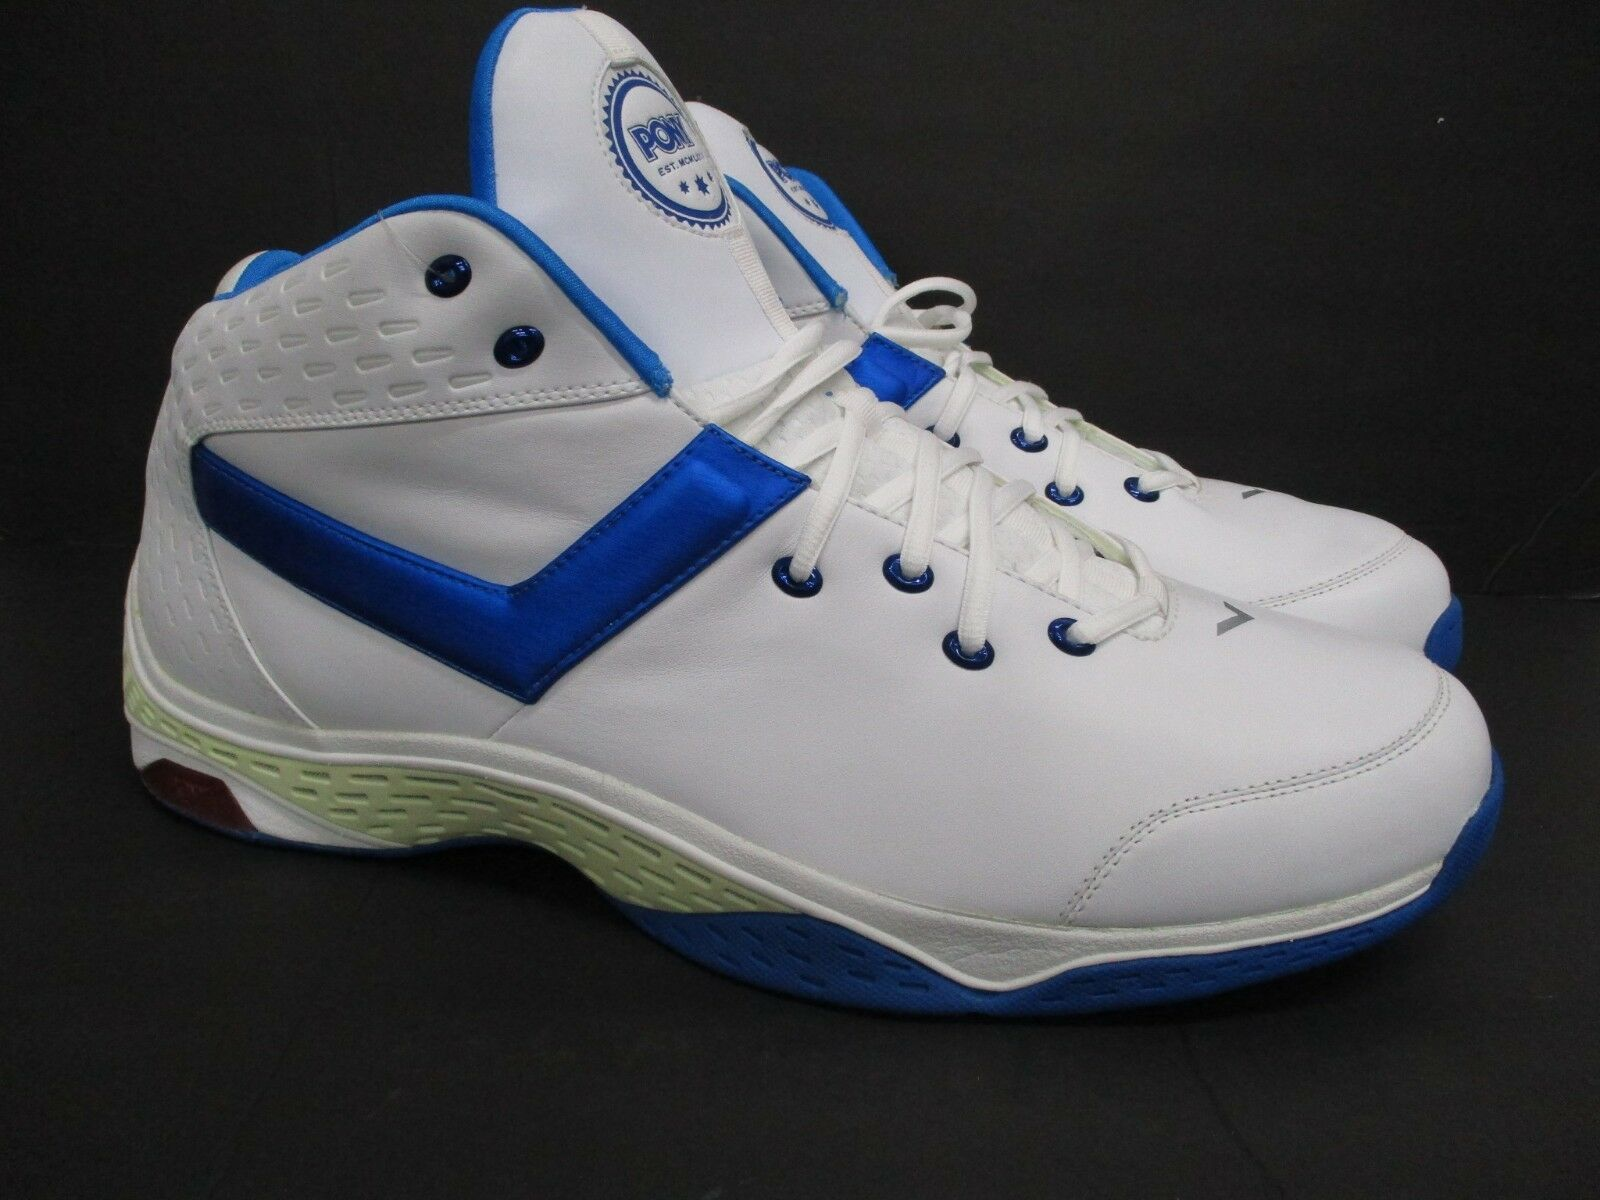 Pony Men's Sneakers shoes EKG High Top White Royal bluee Size  18